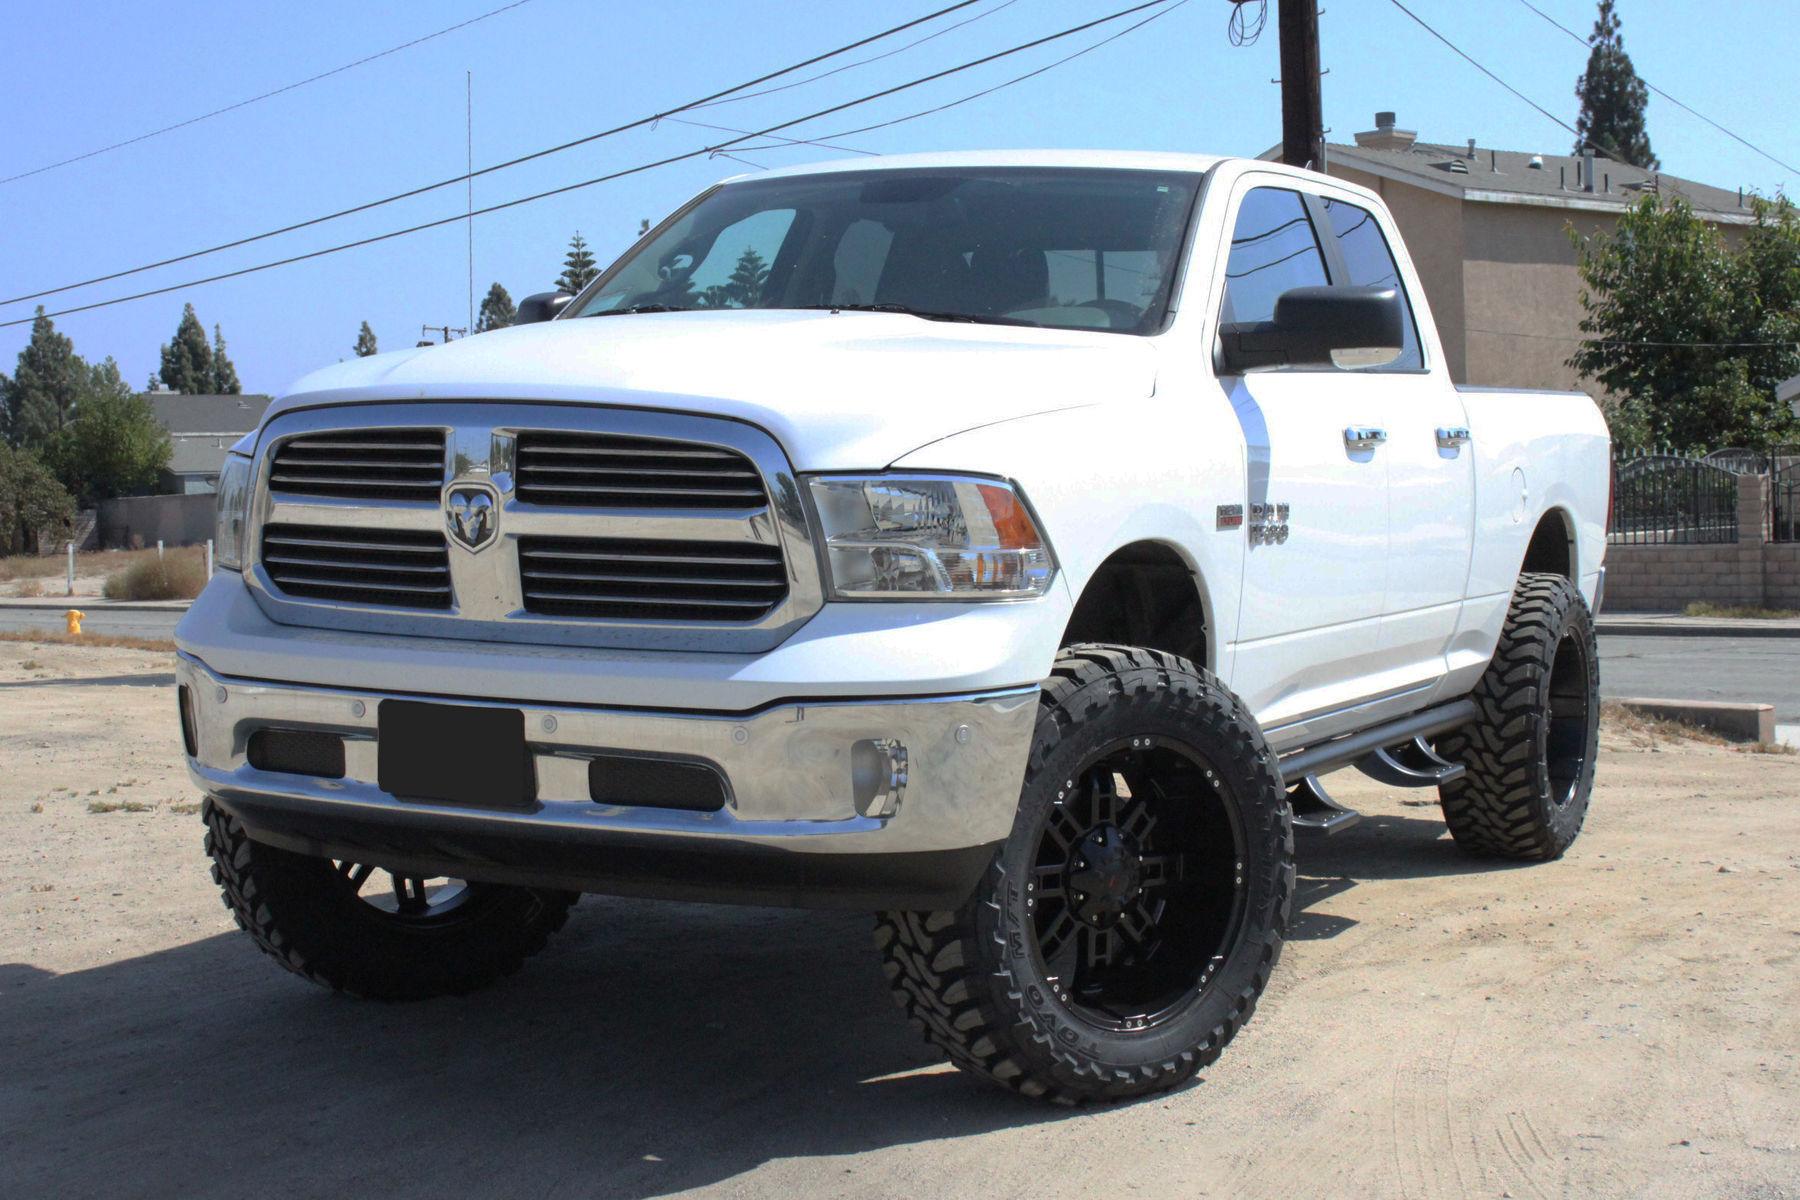 2014 Dodge Ram Pickup 1500 | Ram 1500 7